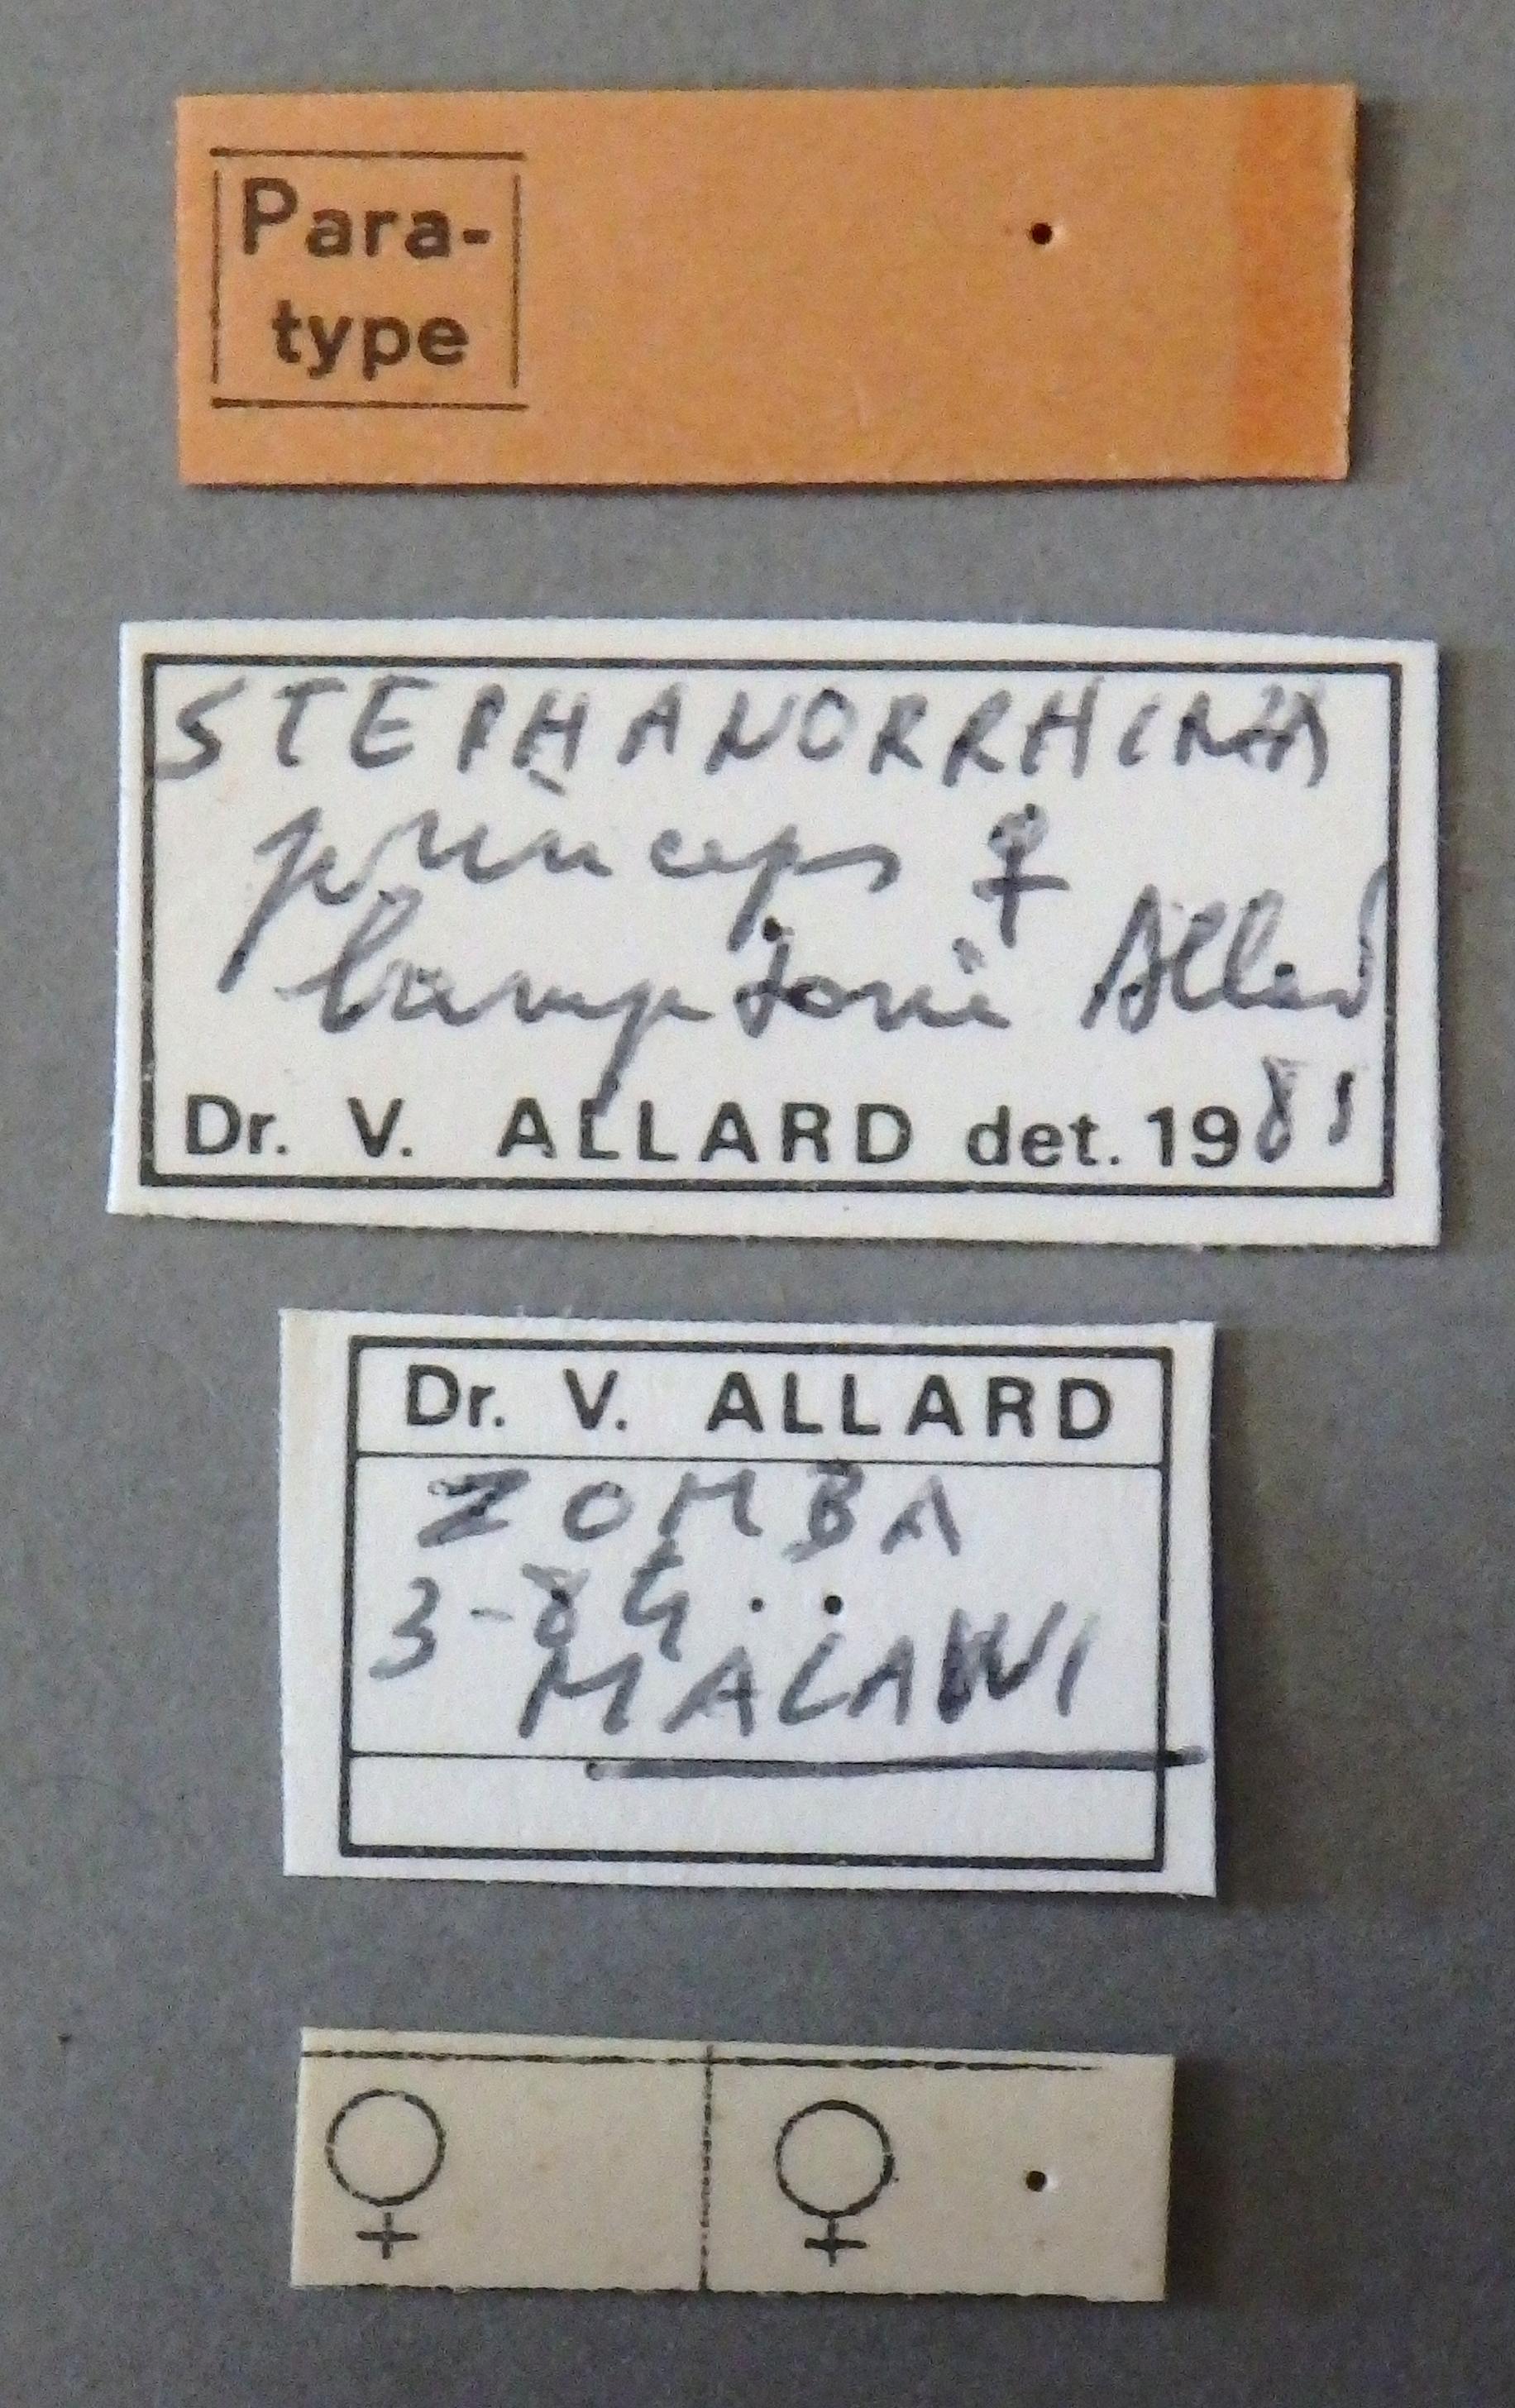 Stephanorrhina princeps bamptoni pt 2 Lb.JPG